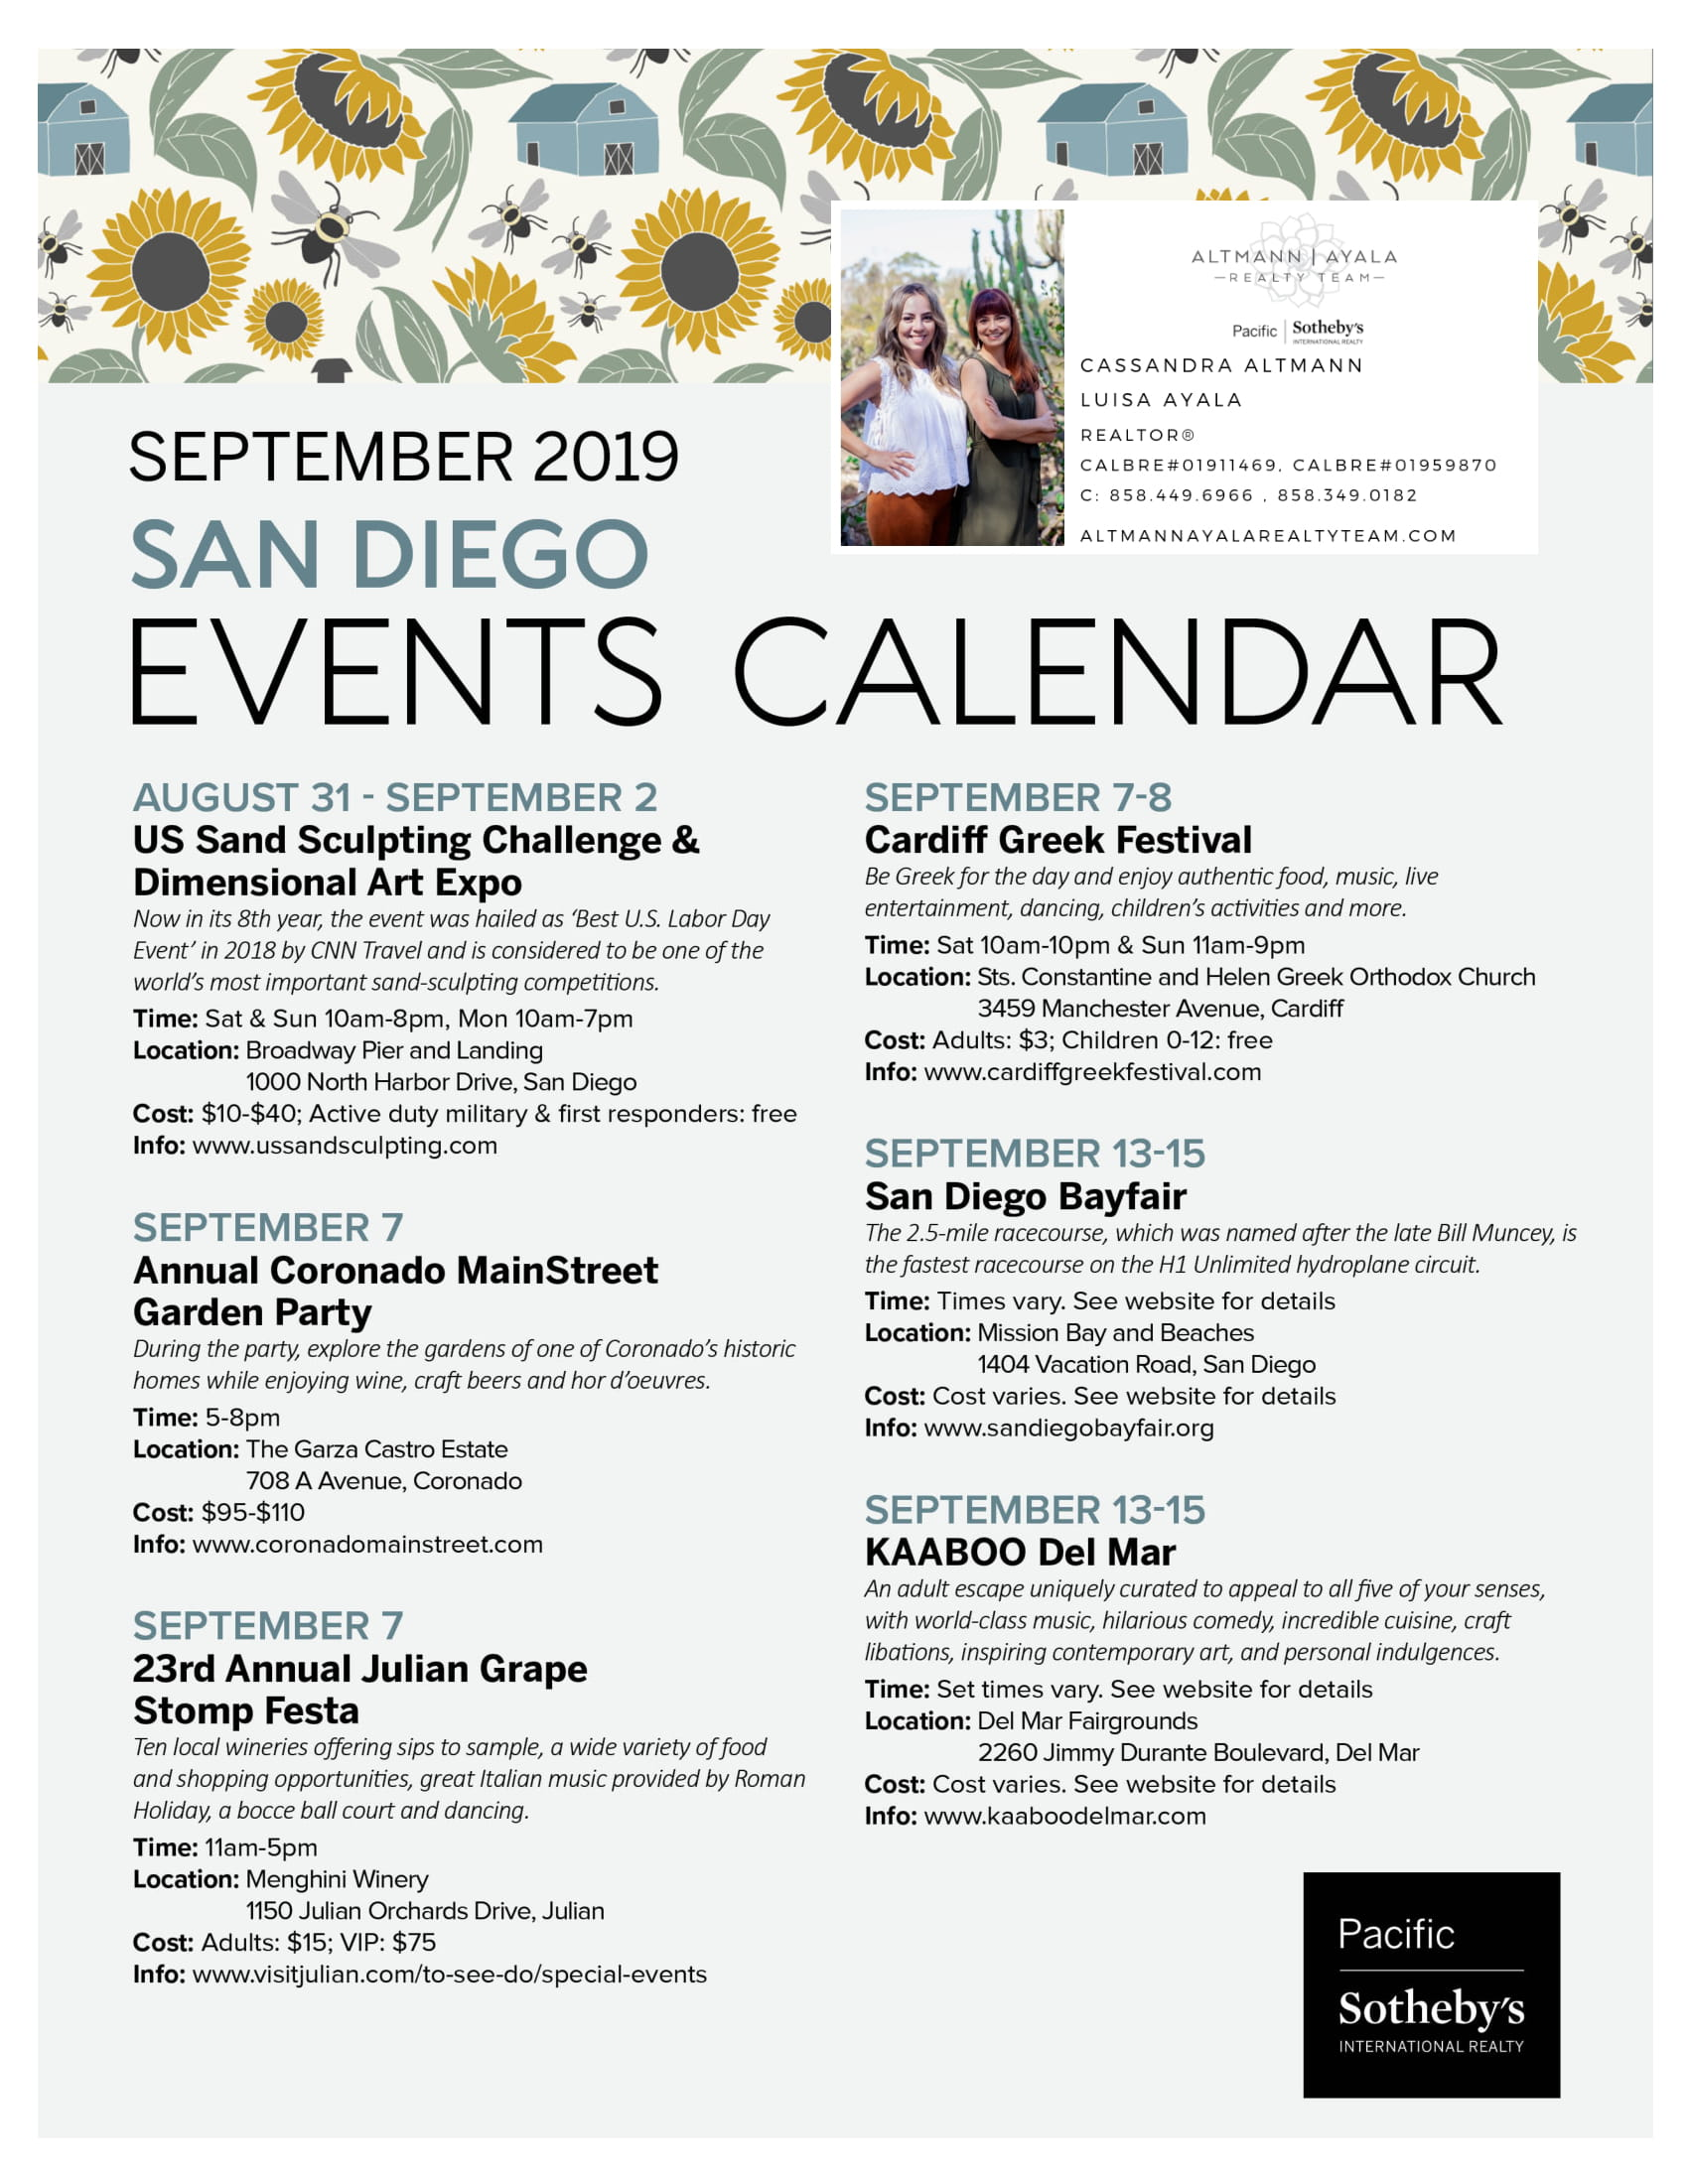 September 2019: San Diego Events Calendar